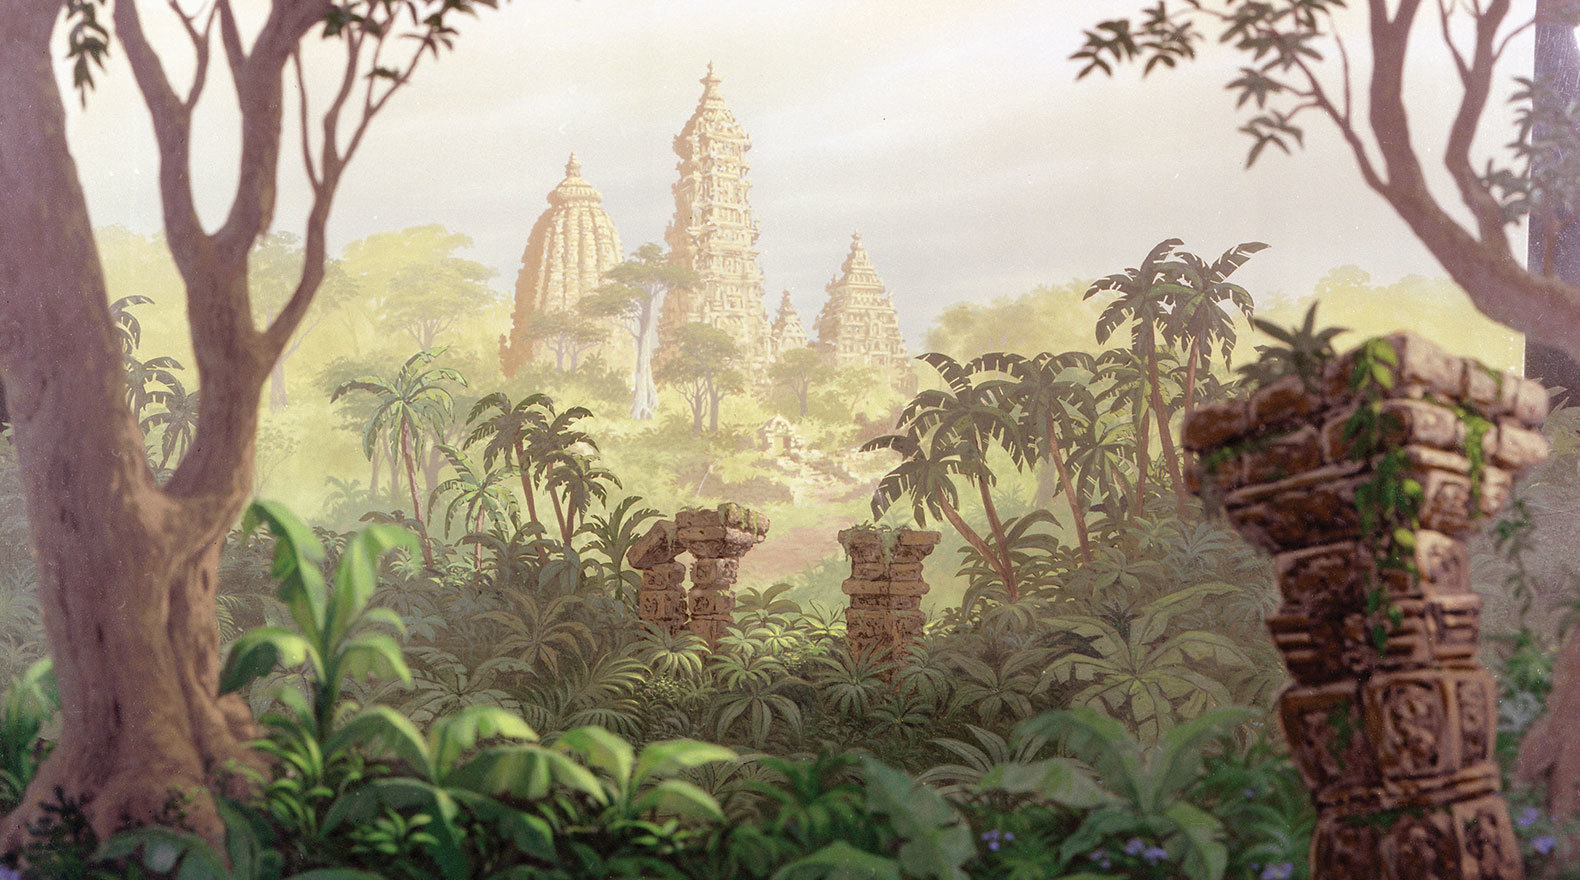 The Jungle Book Gallery